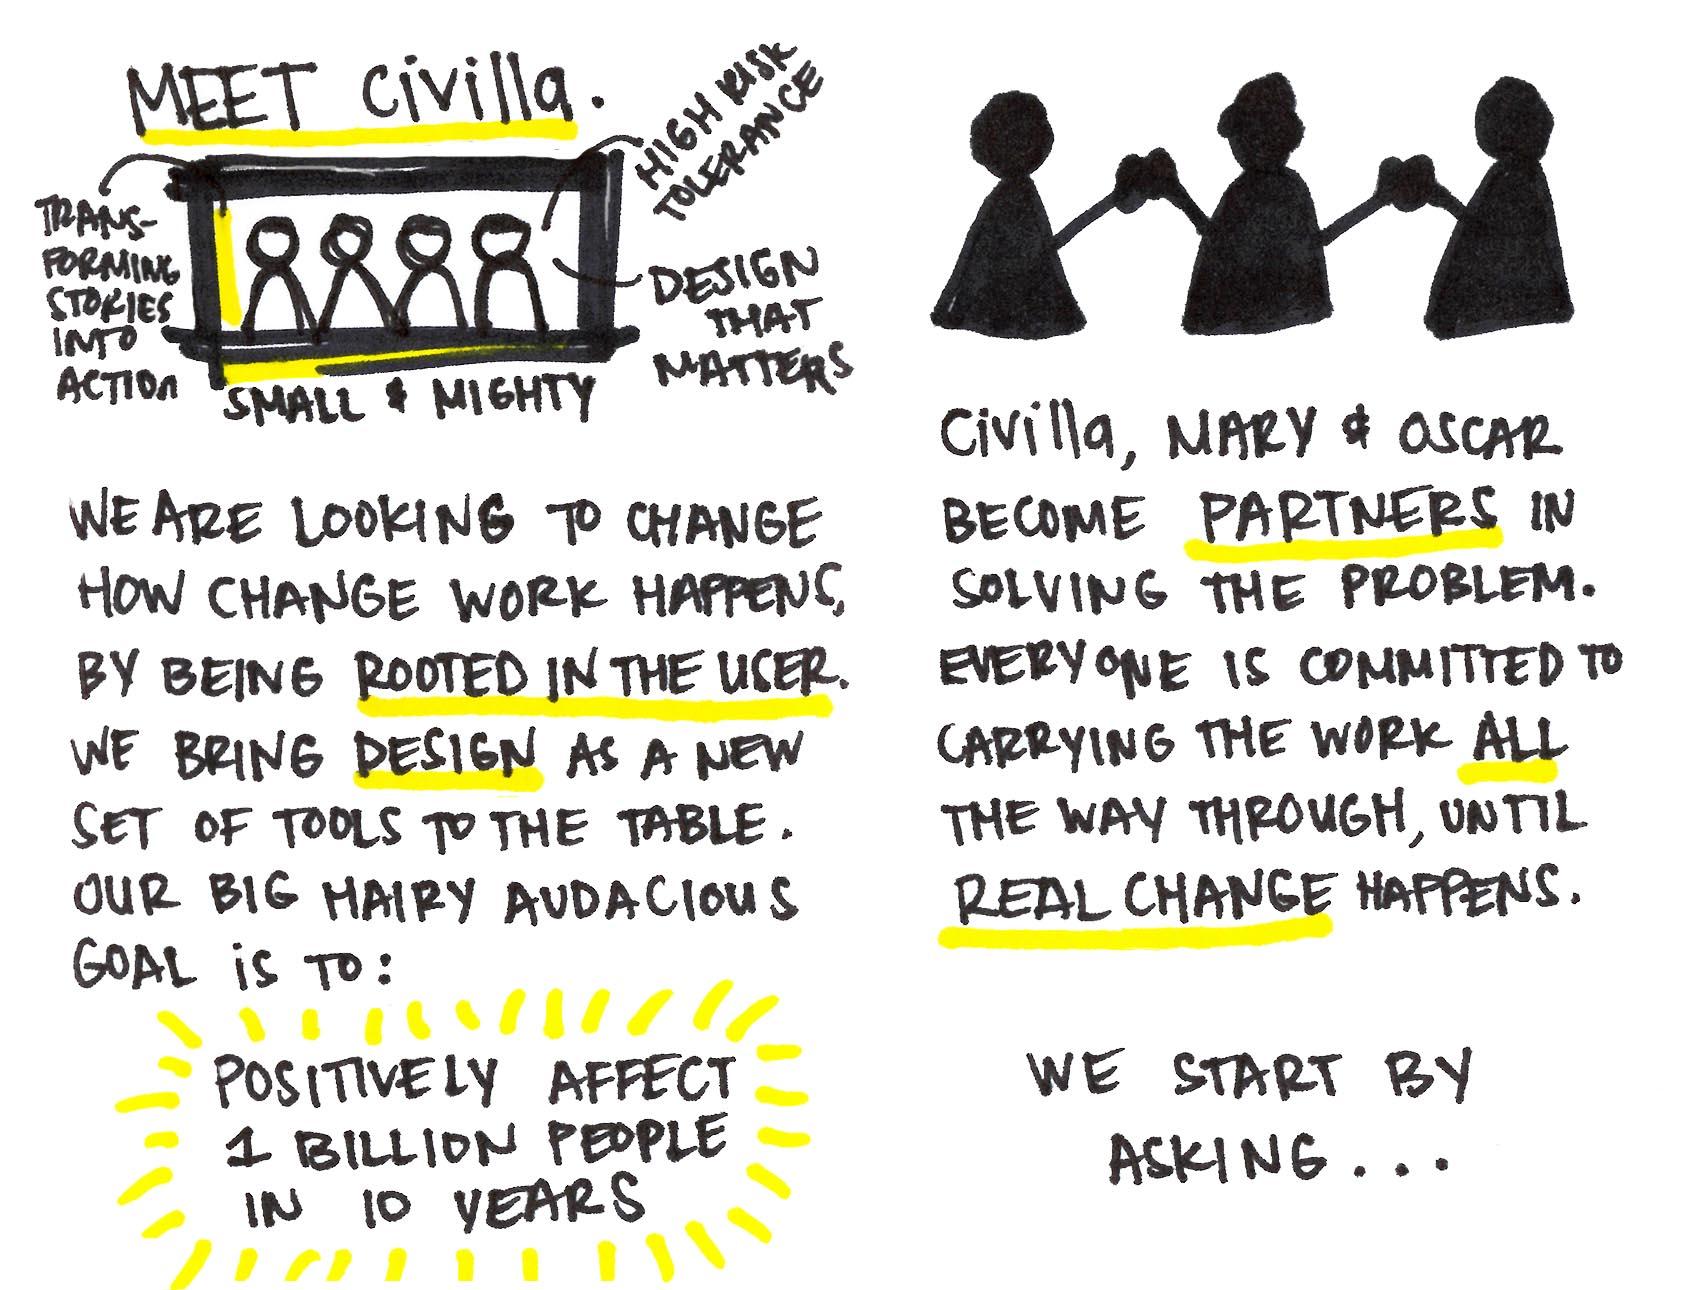 civilla storybook_3.jpg